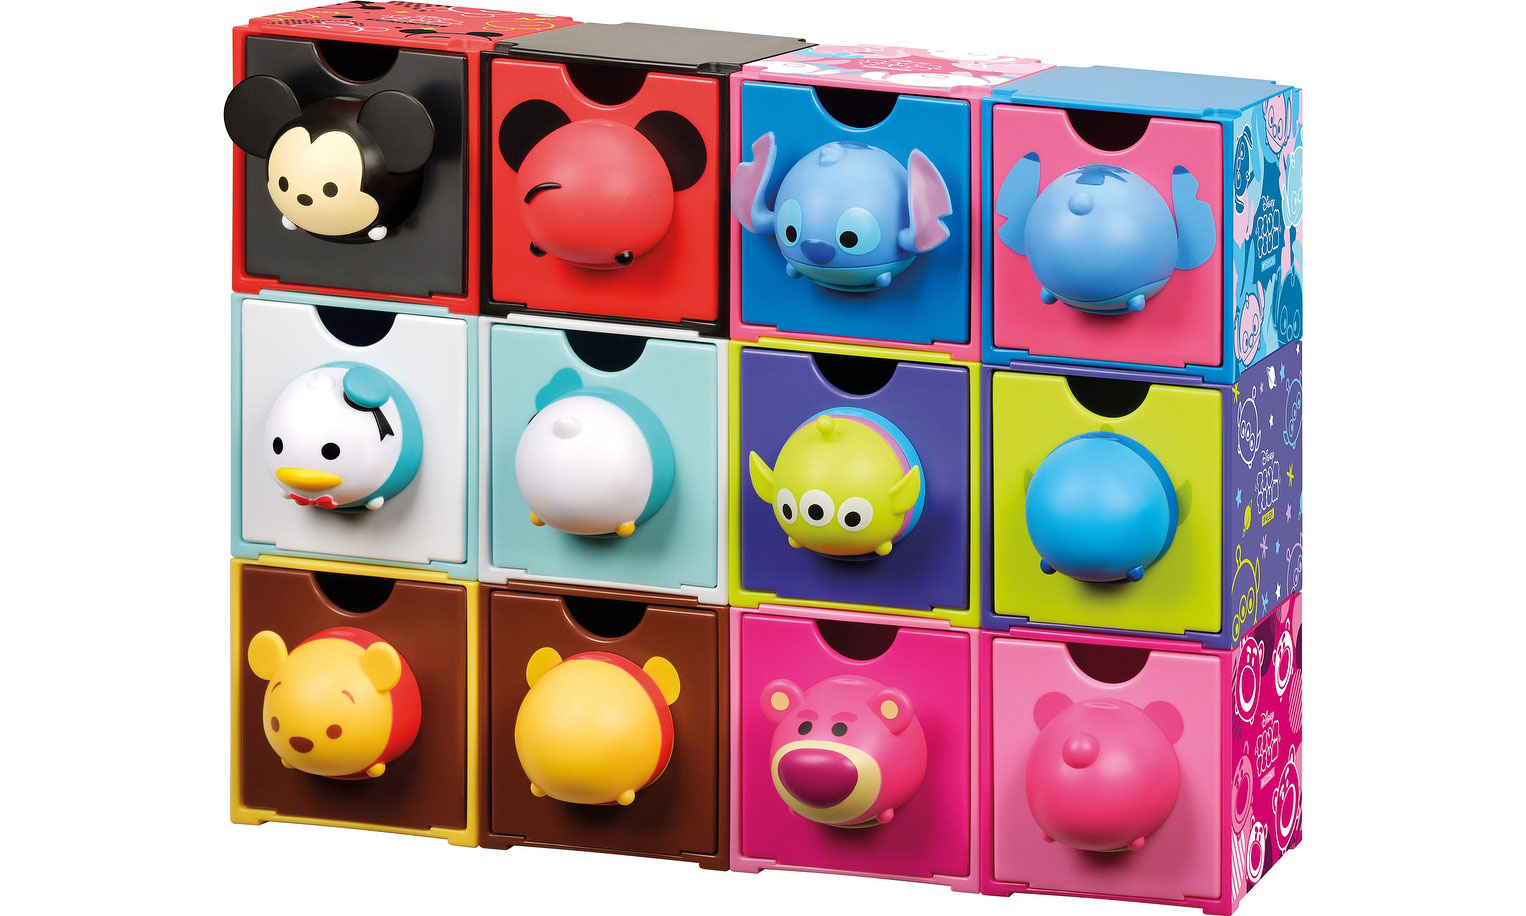 7-Eleven x Disney ,6 位卡通人物做成的百变组合箱